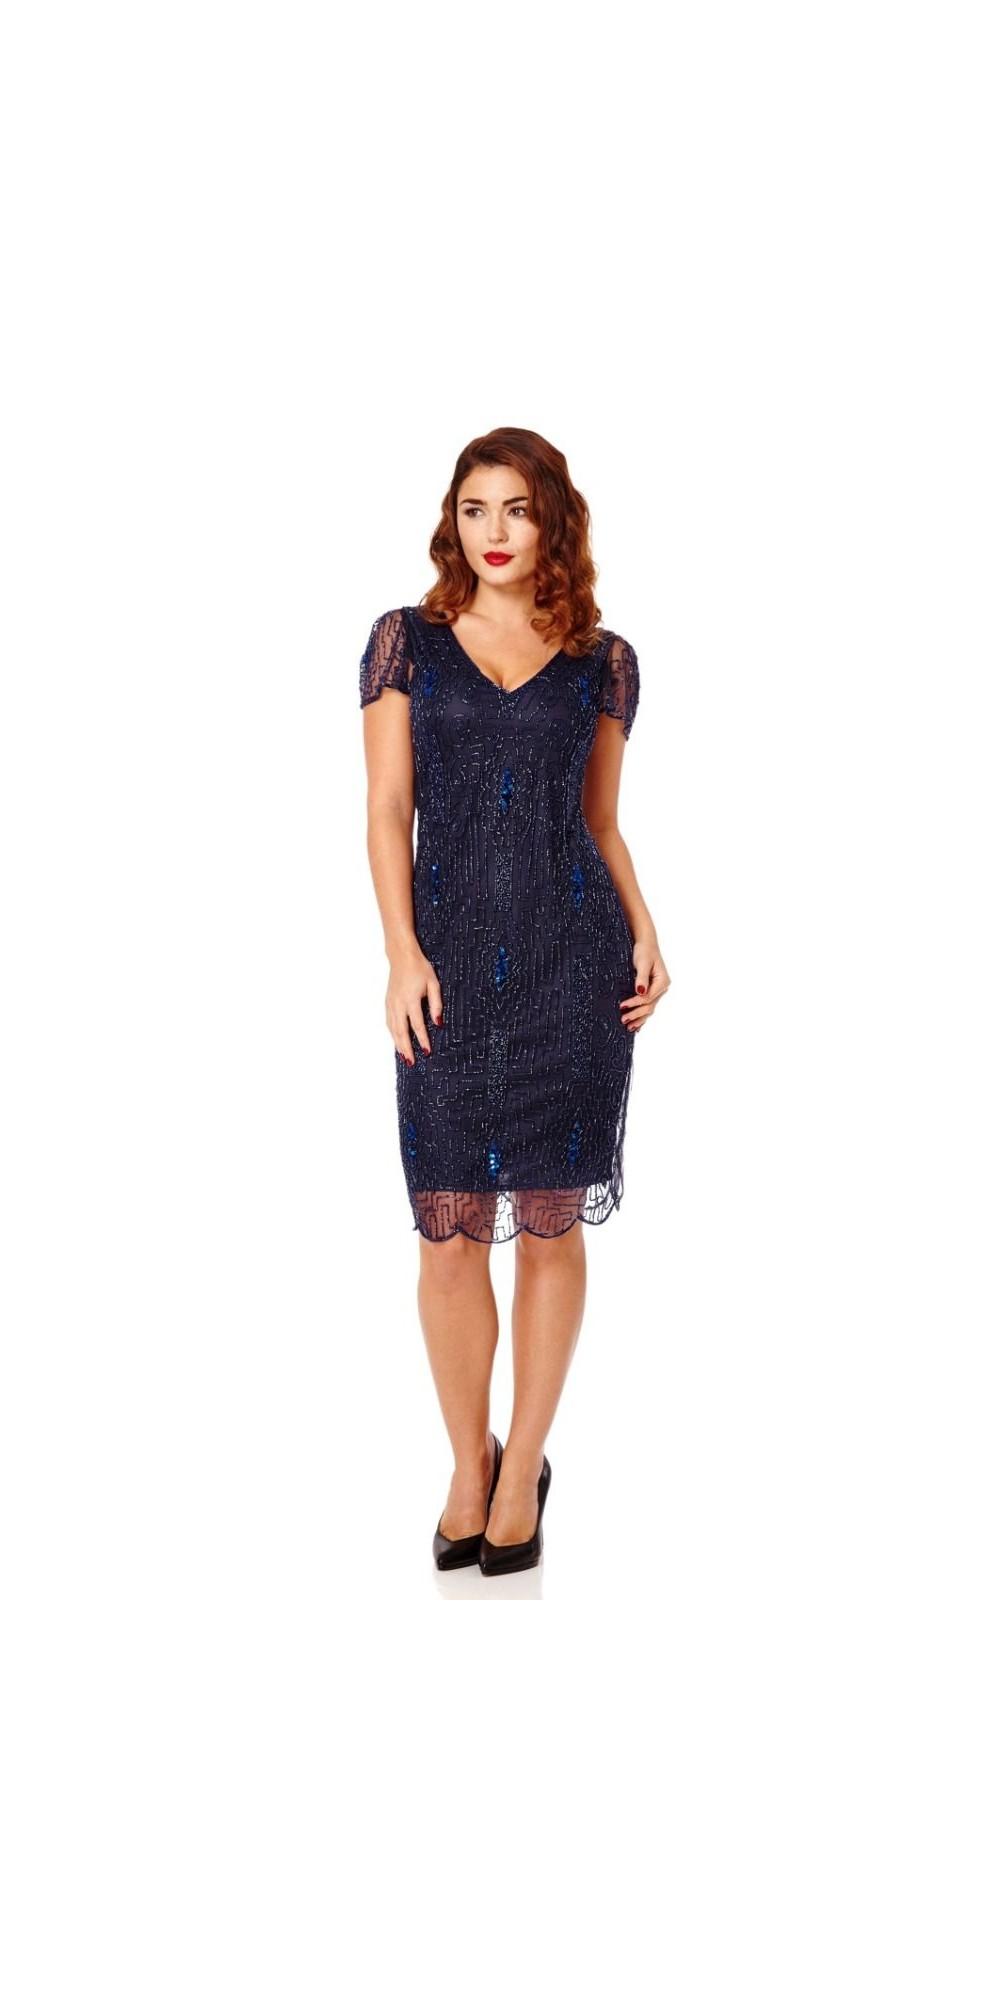 1920 Style Beaded Dress in Navy Blue